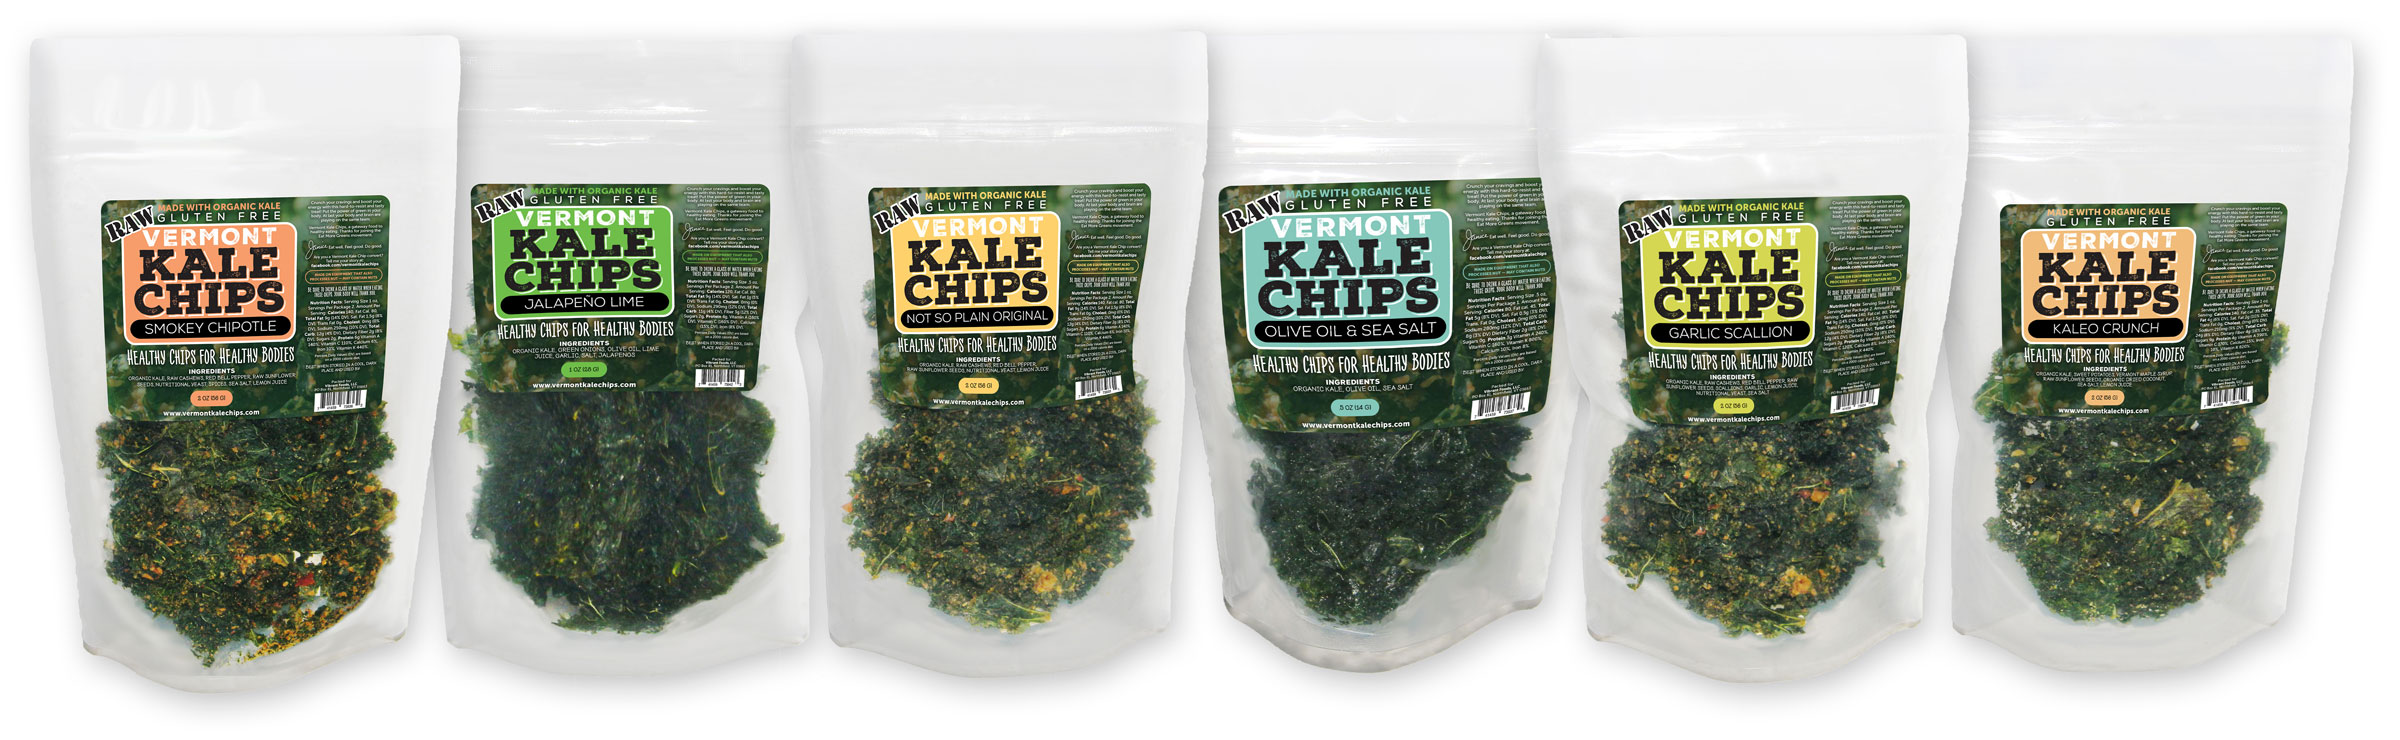 vermont-kale-chips-kale-hero4.jpg